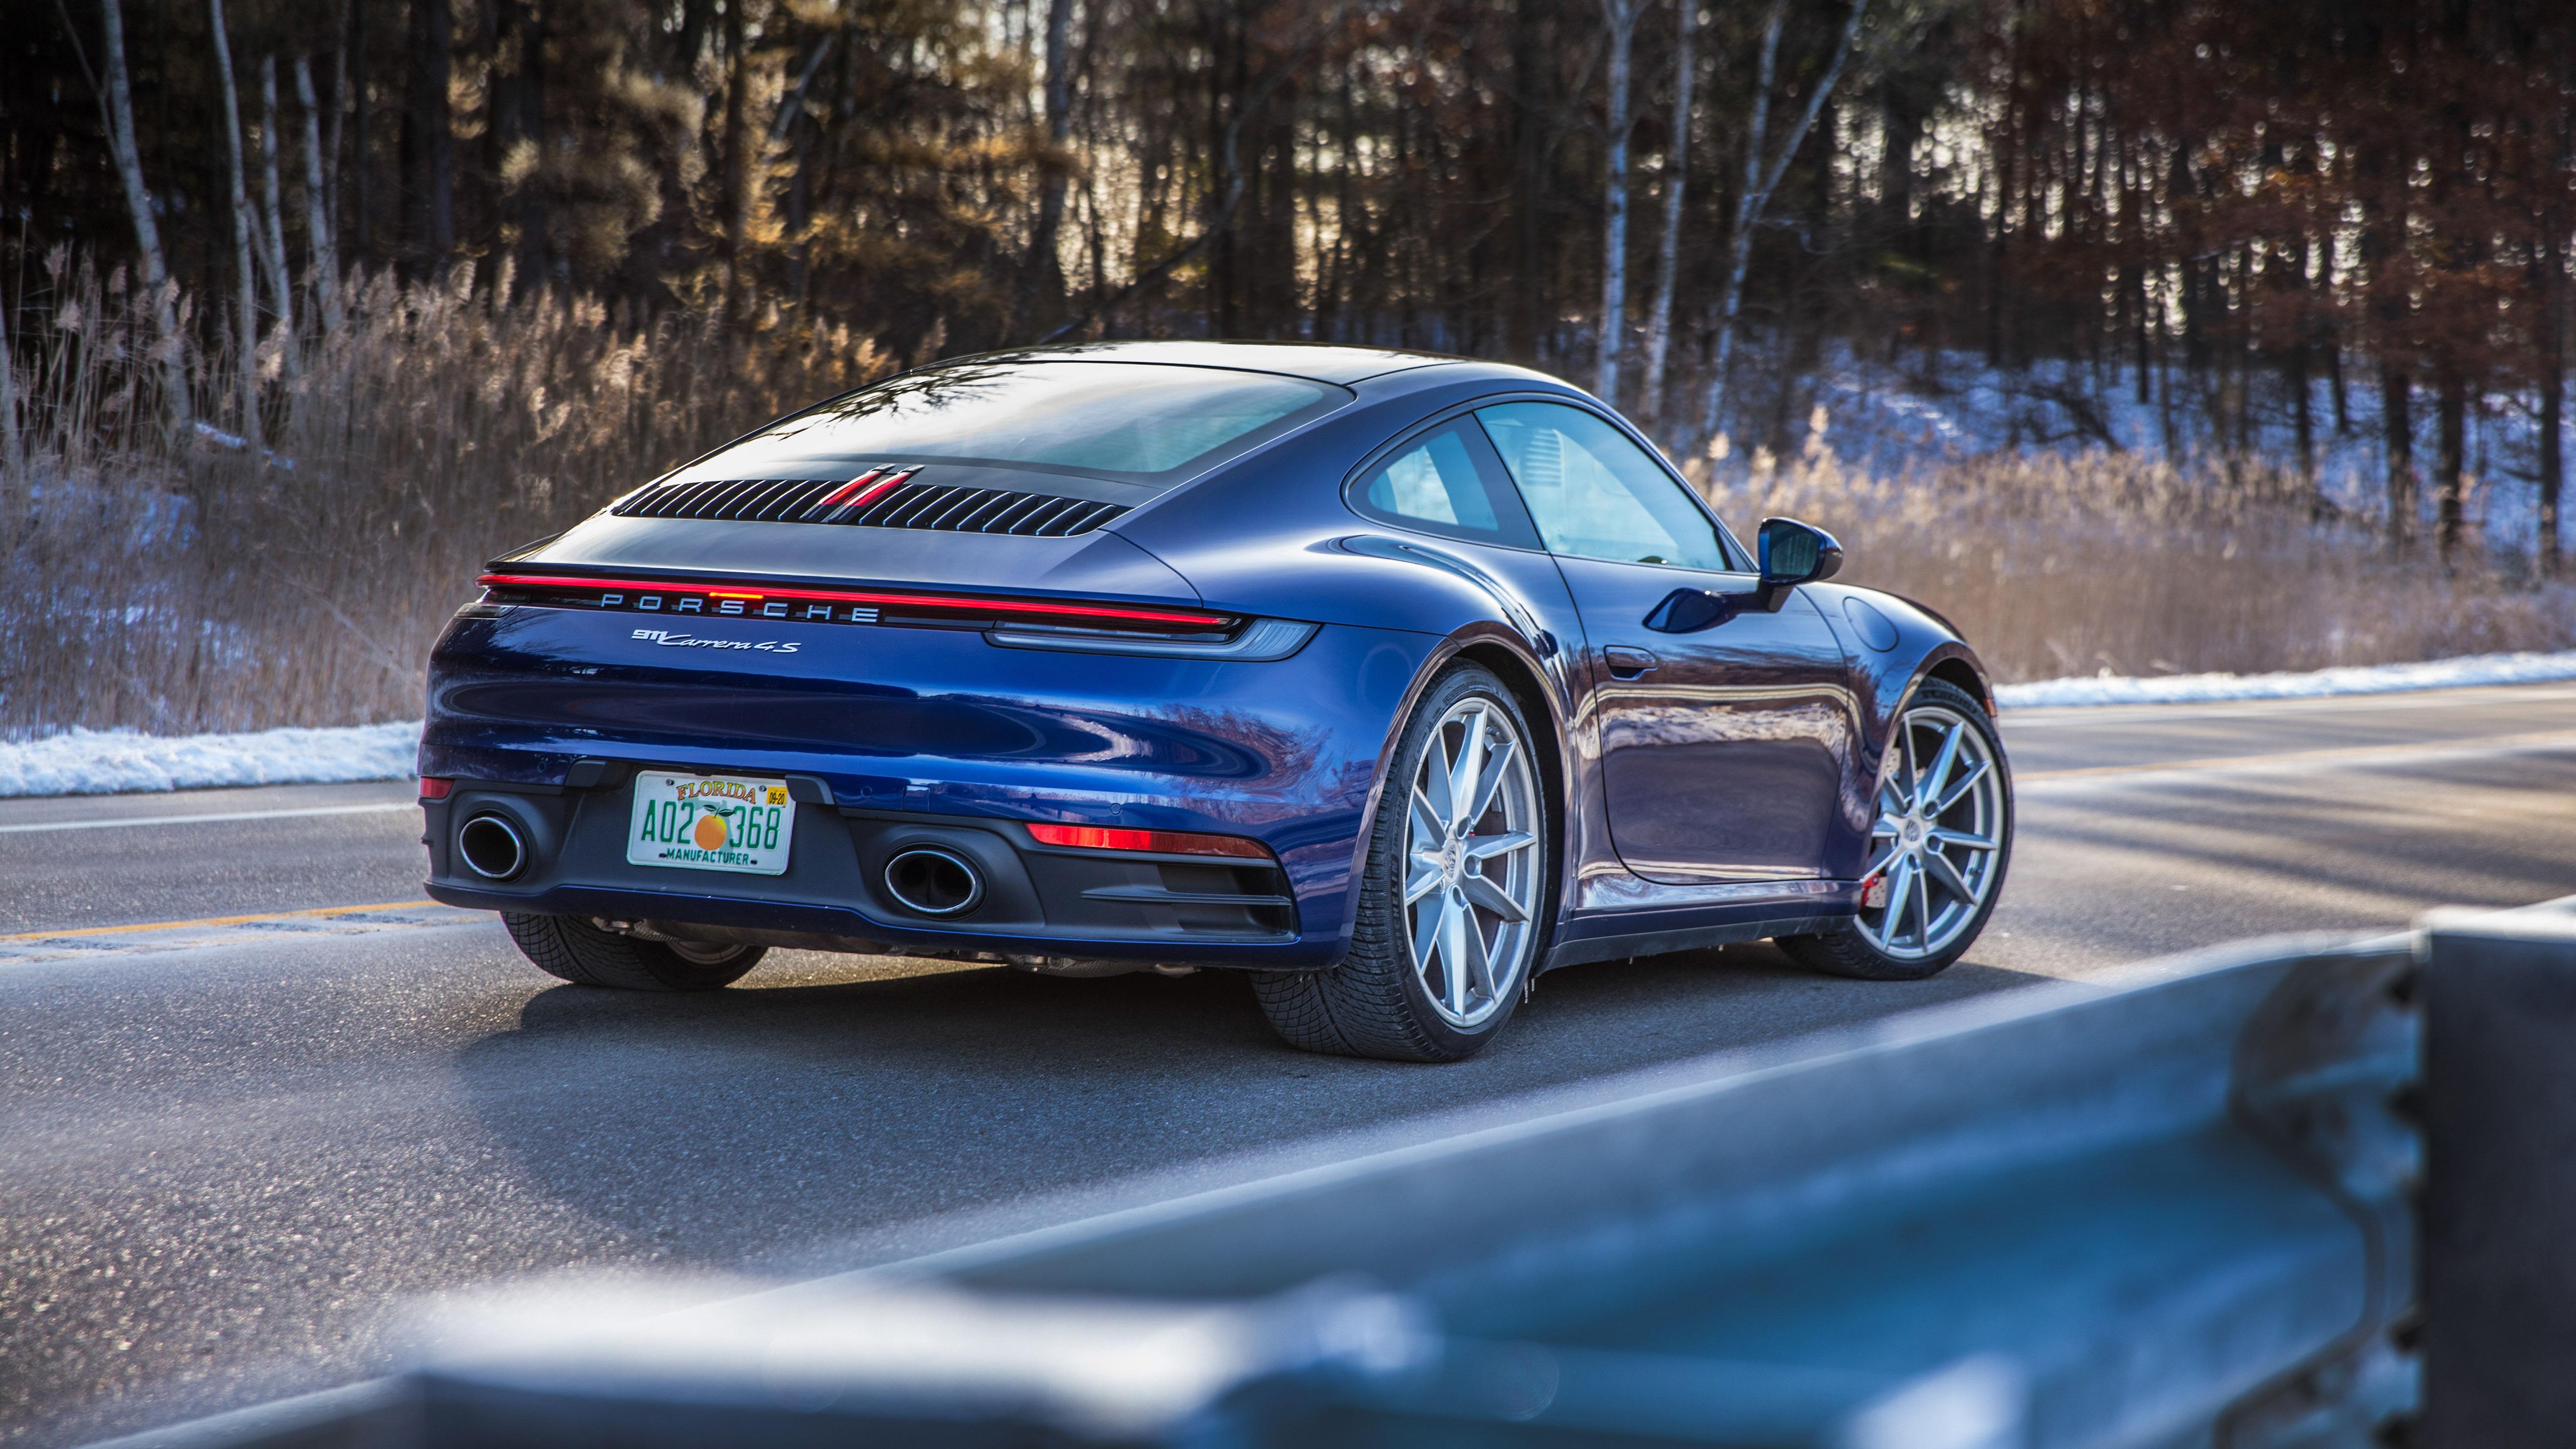 2020 Porsche 911 Carrera 4S 5K 2 Wallpaper HD Car Wallpapers 5120x2880